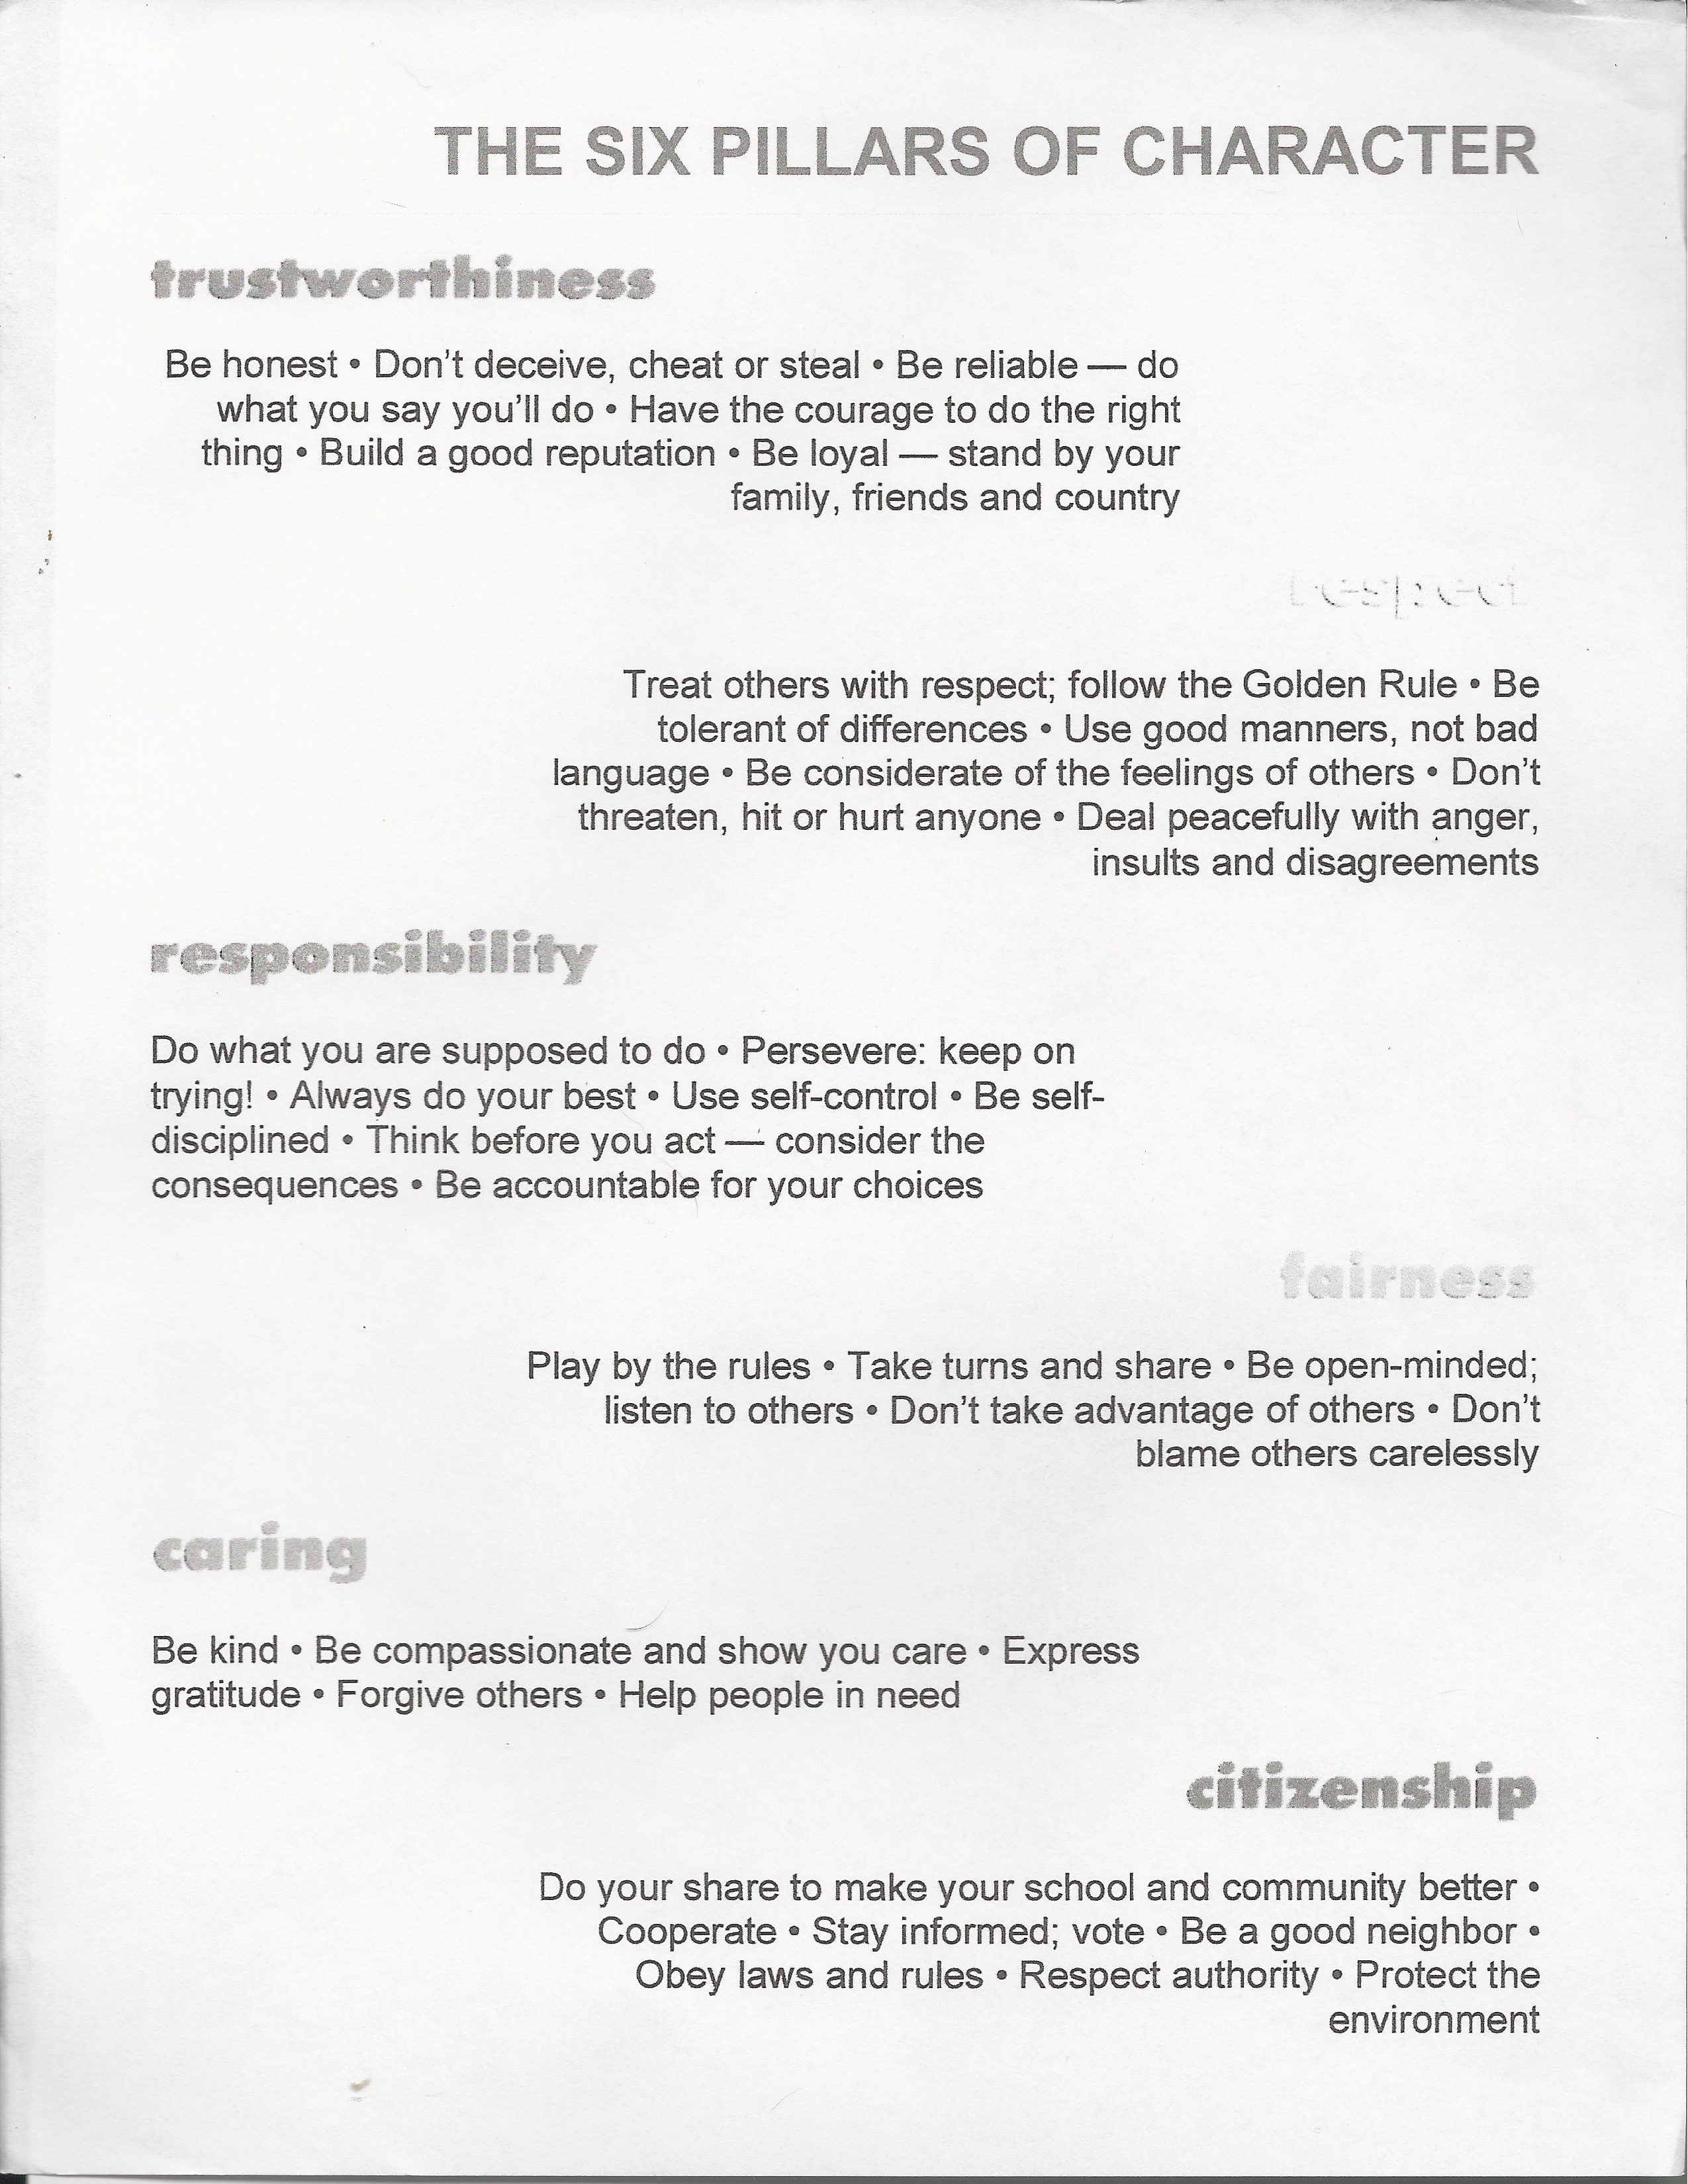 004 Essay Example Trust Pillars Of Character Fantastic Titles Essays Free Full